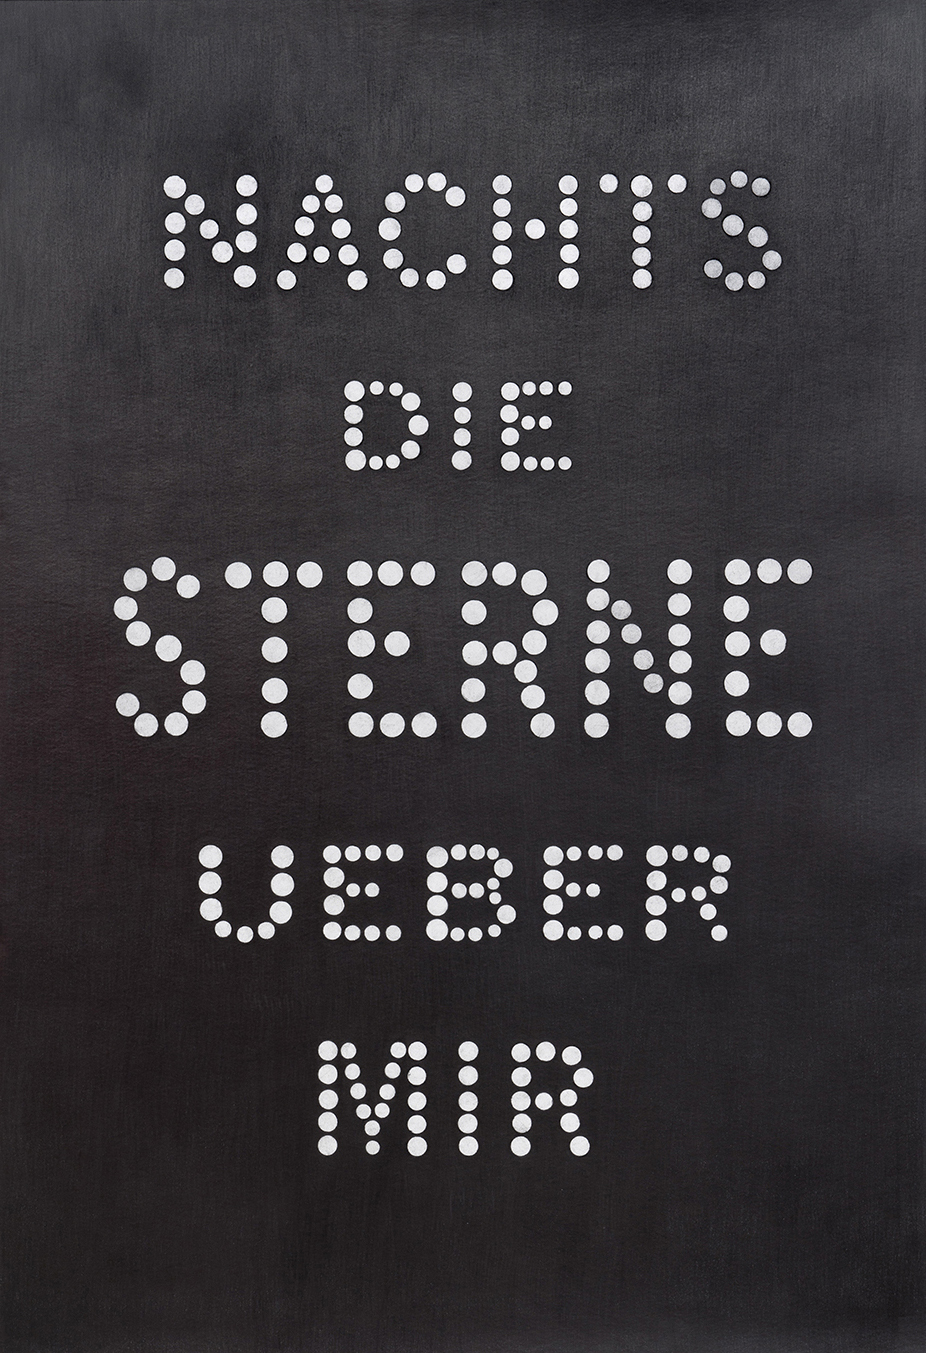 "Carl Trahan,  The Sacred Canopy - Nachts dia Sterne uber mir , 2018, graphite sur papier, 111 x 77 cm (44"" x 30"")"